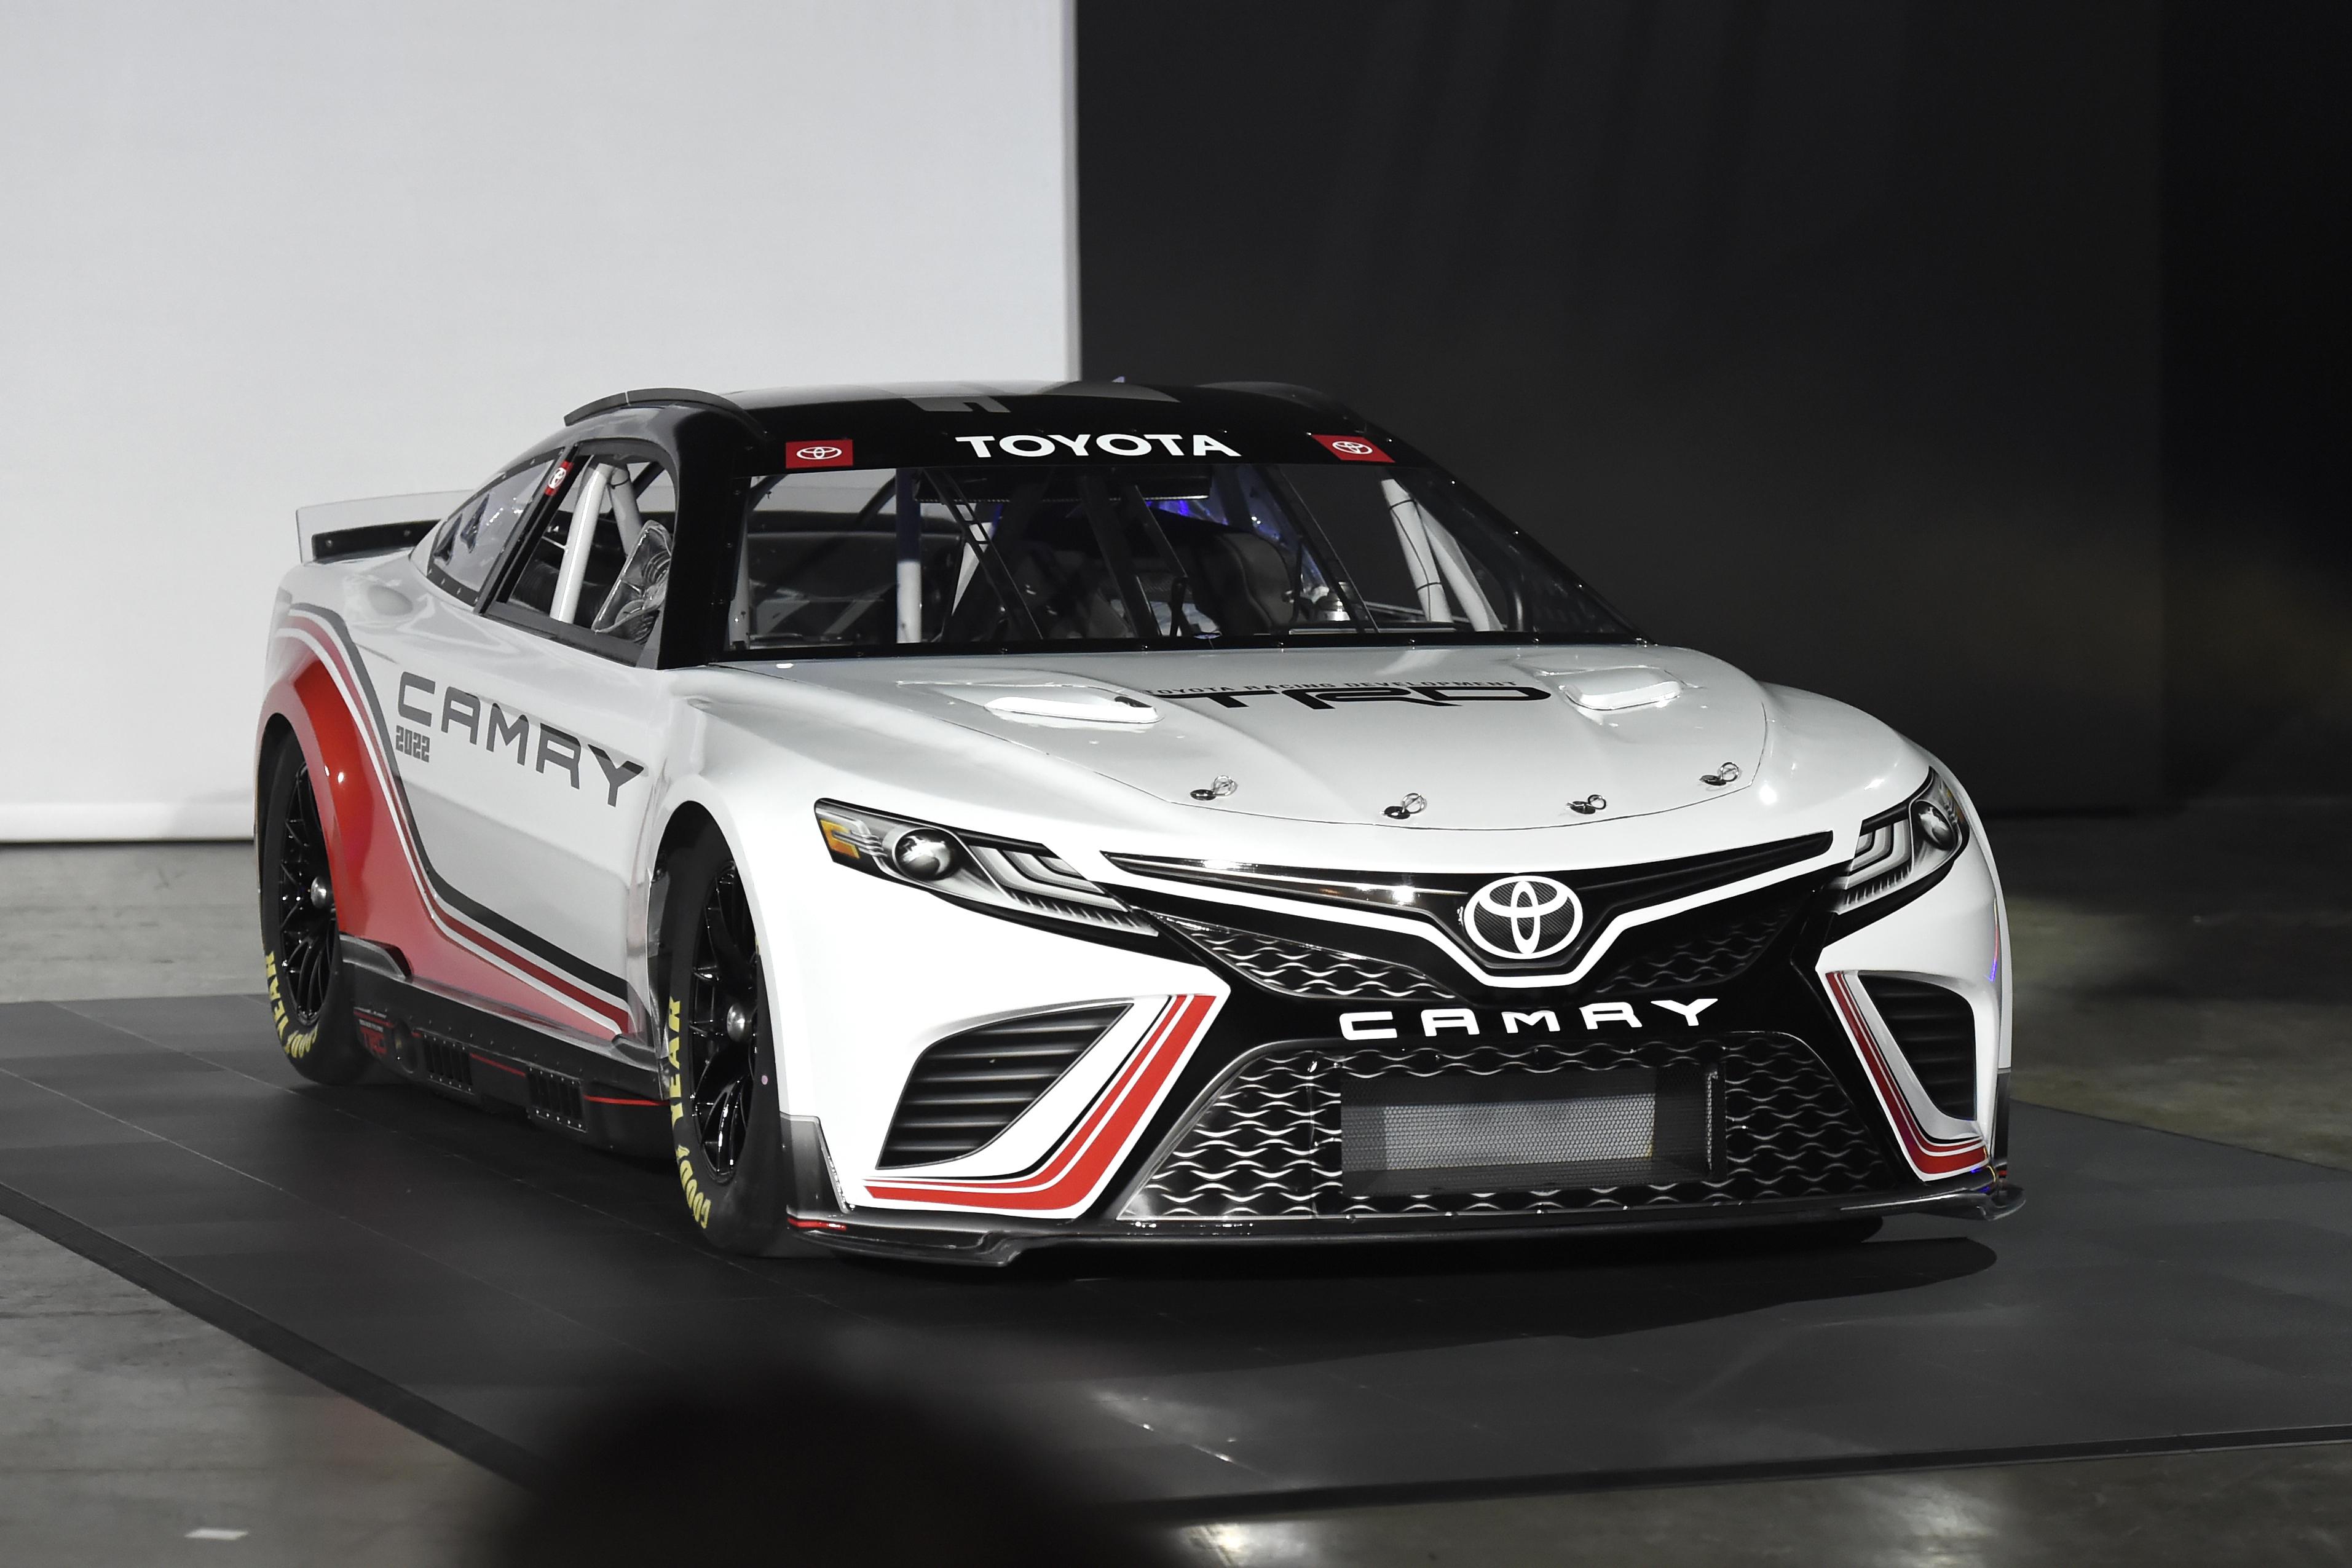 NASCAR_Next_Gen_Auto_Racing.jpg